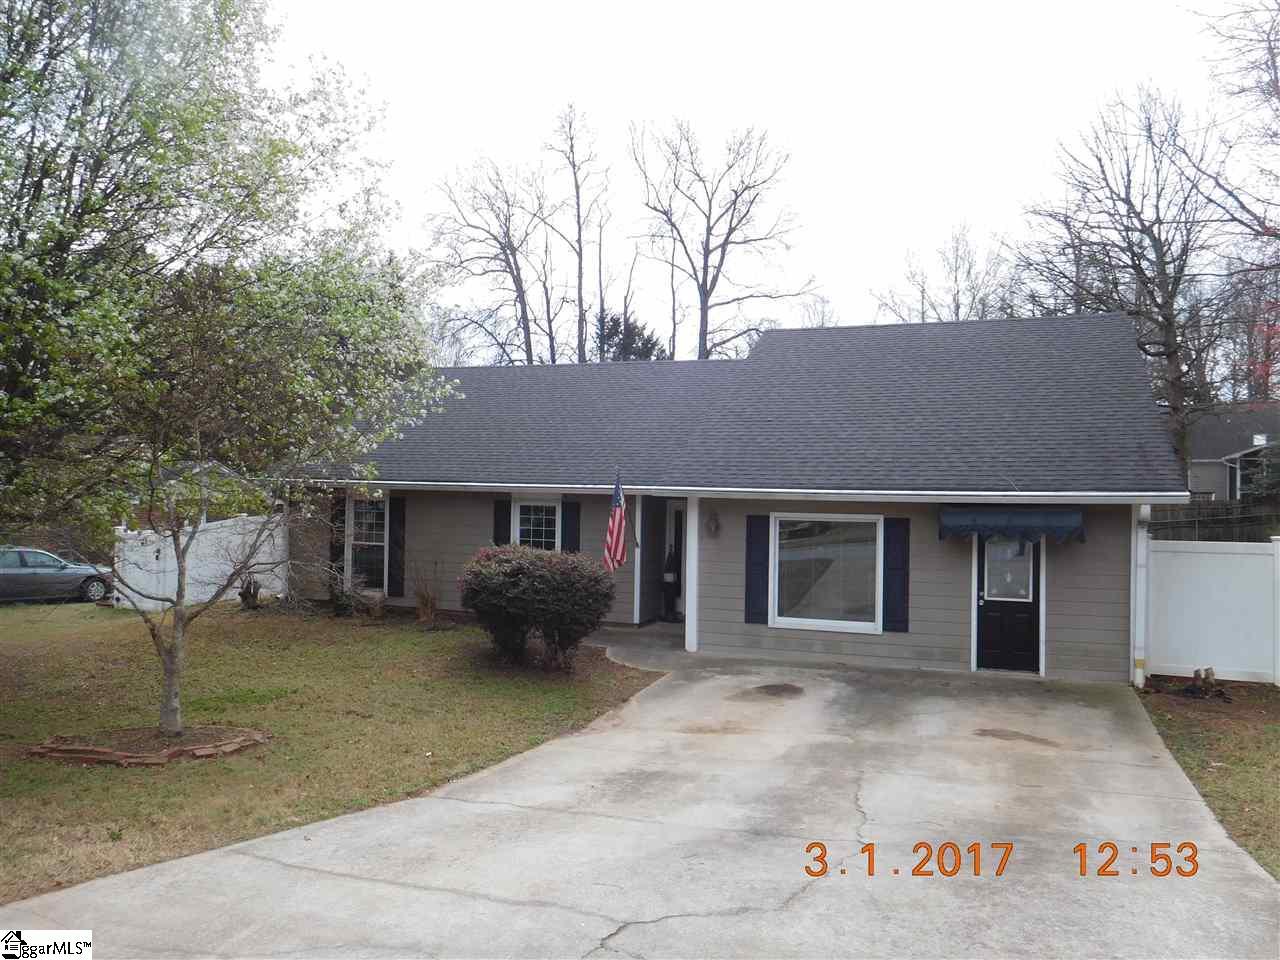 2 Saint Andrews Way, Greenville, SC 29607